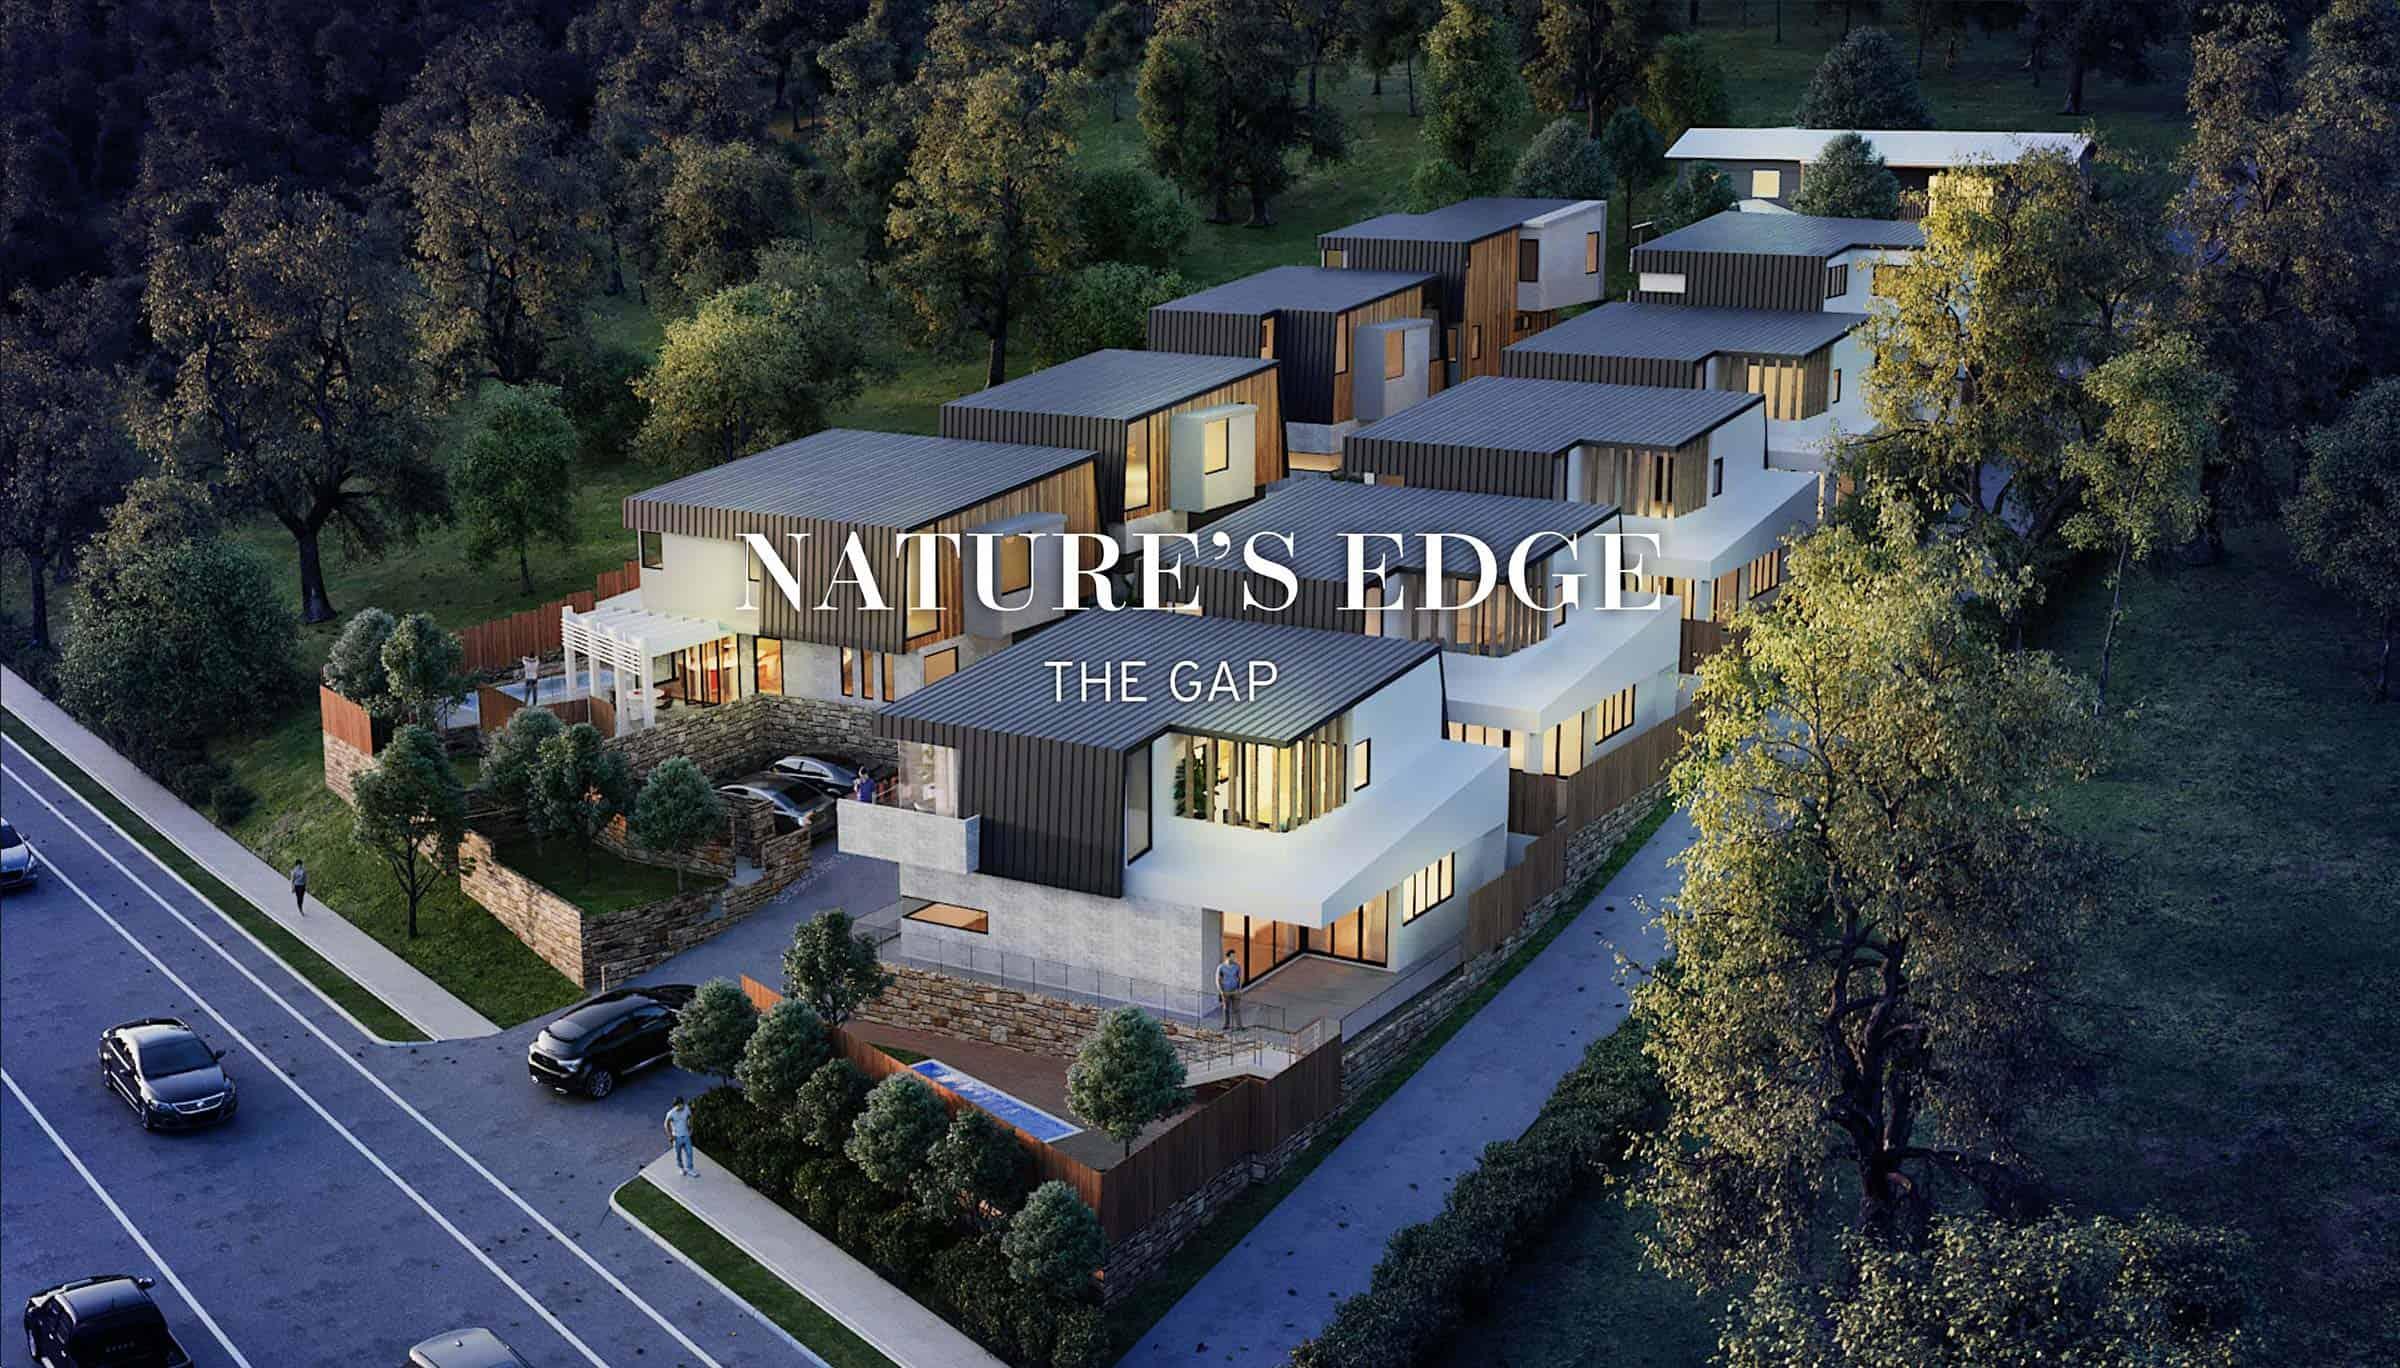 Natures Edge, The Gap